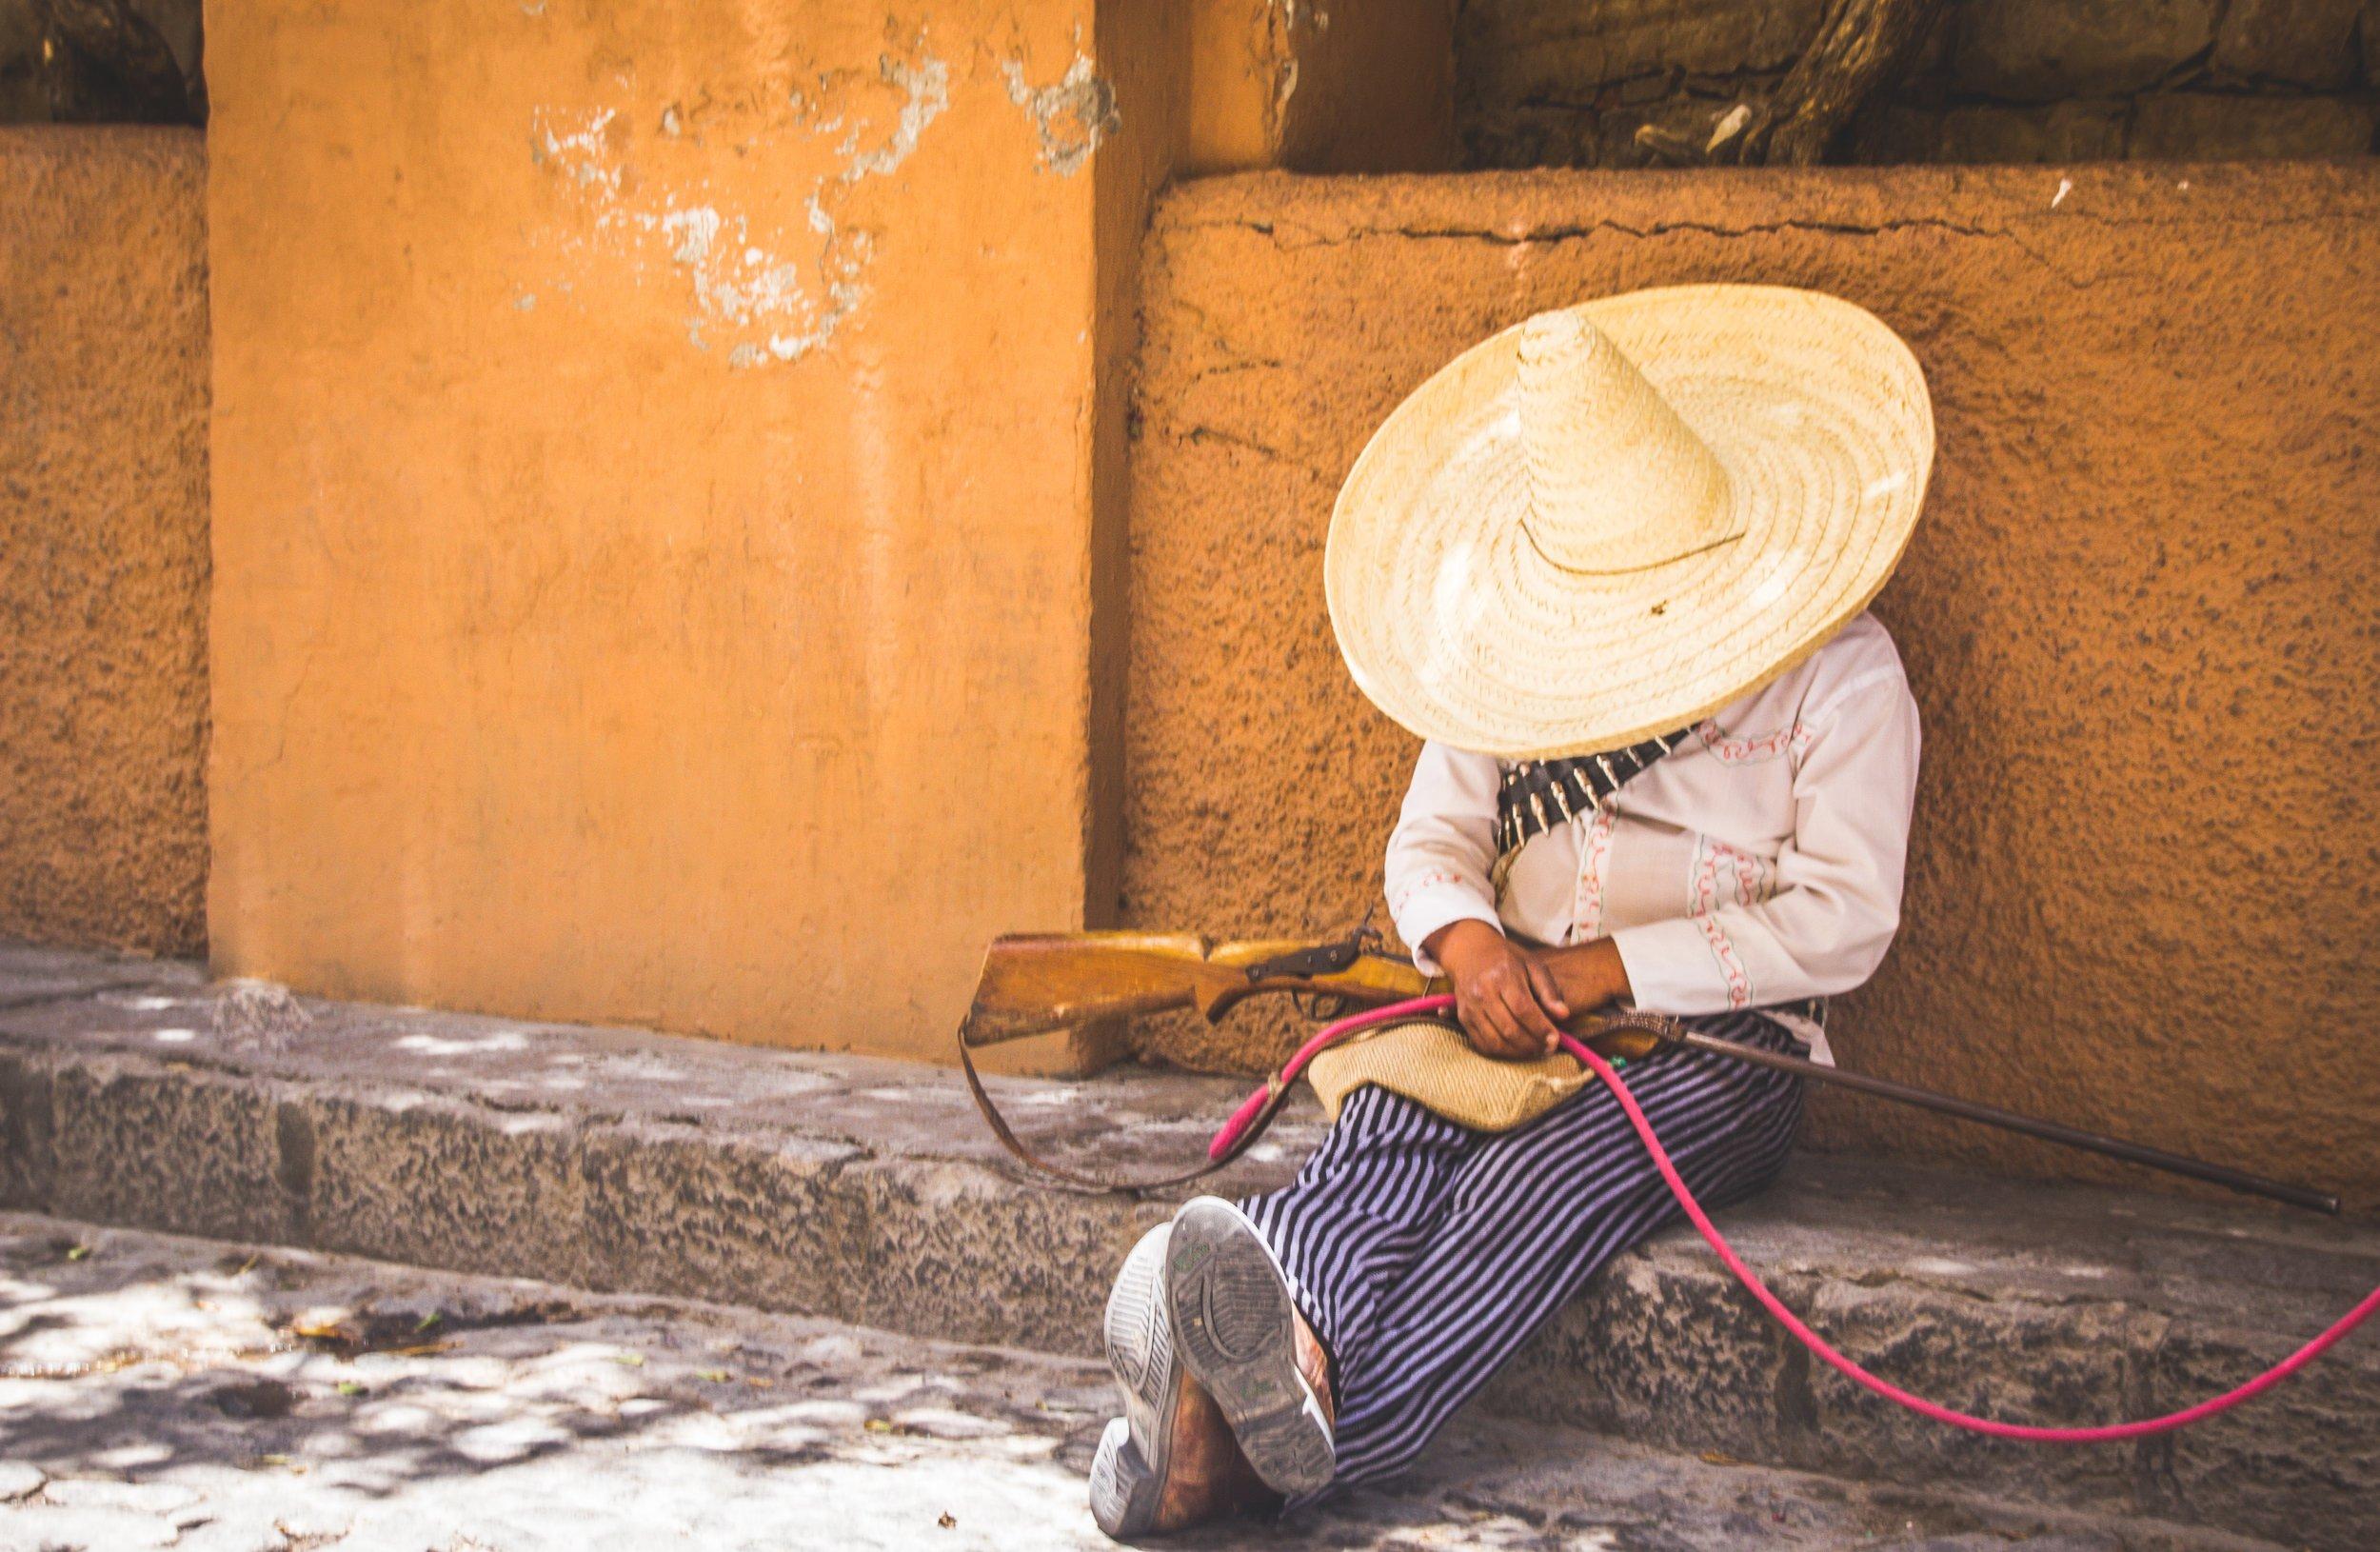 San Miguel de Allende - Learn More →